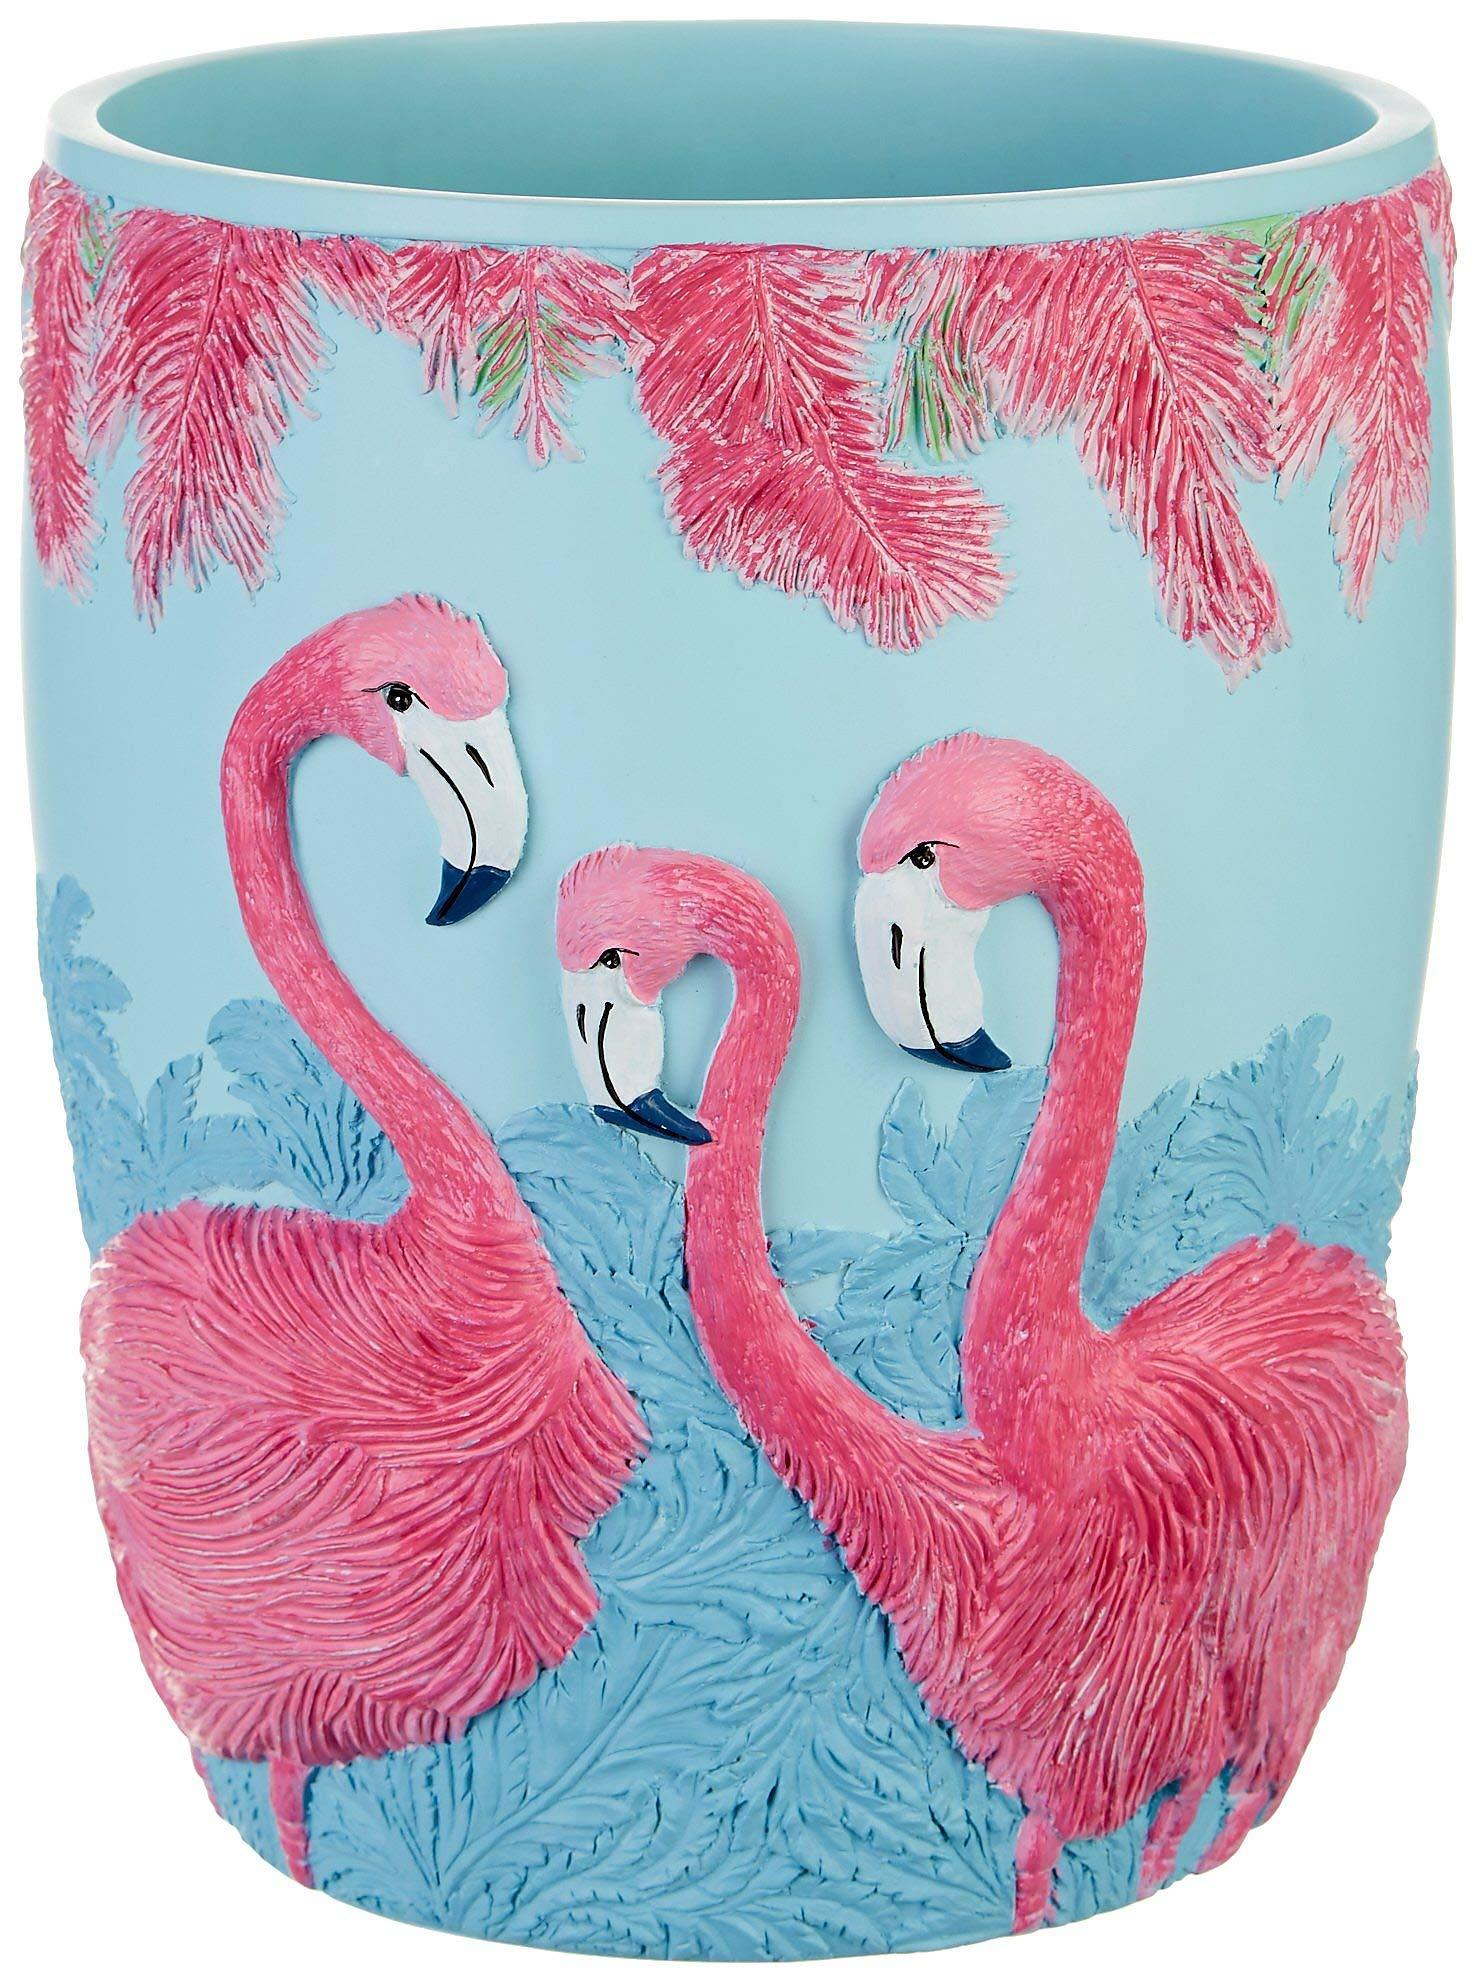 Leoma Lovegrove Pink Power Wastebasket One Size Pink/Blue